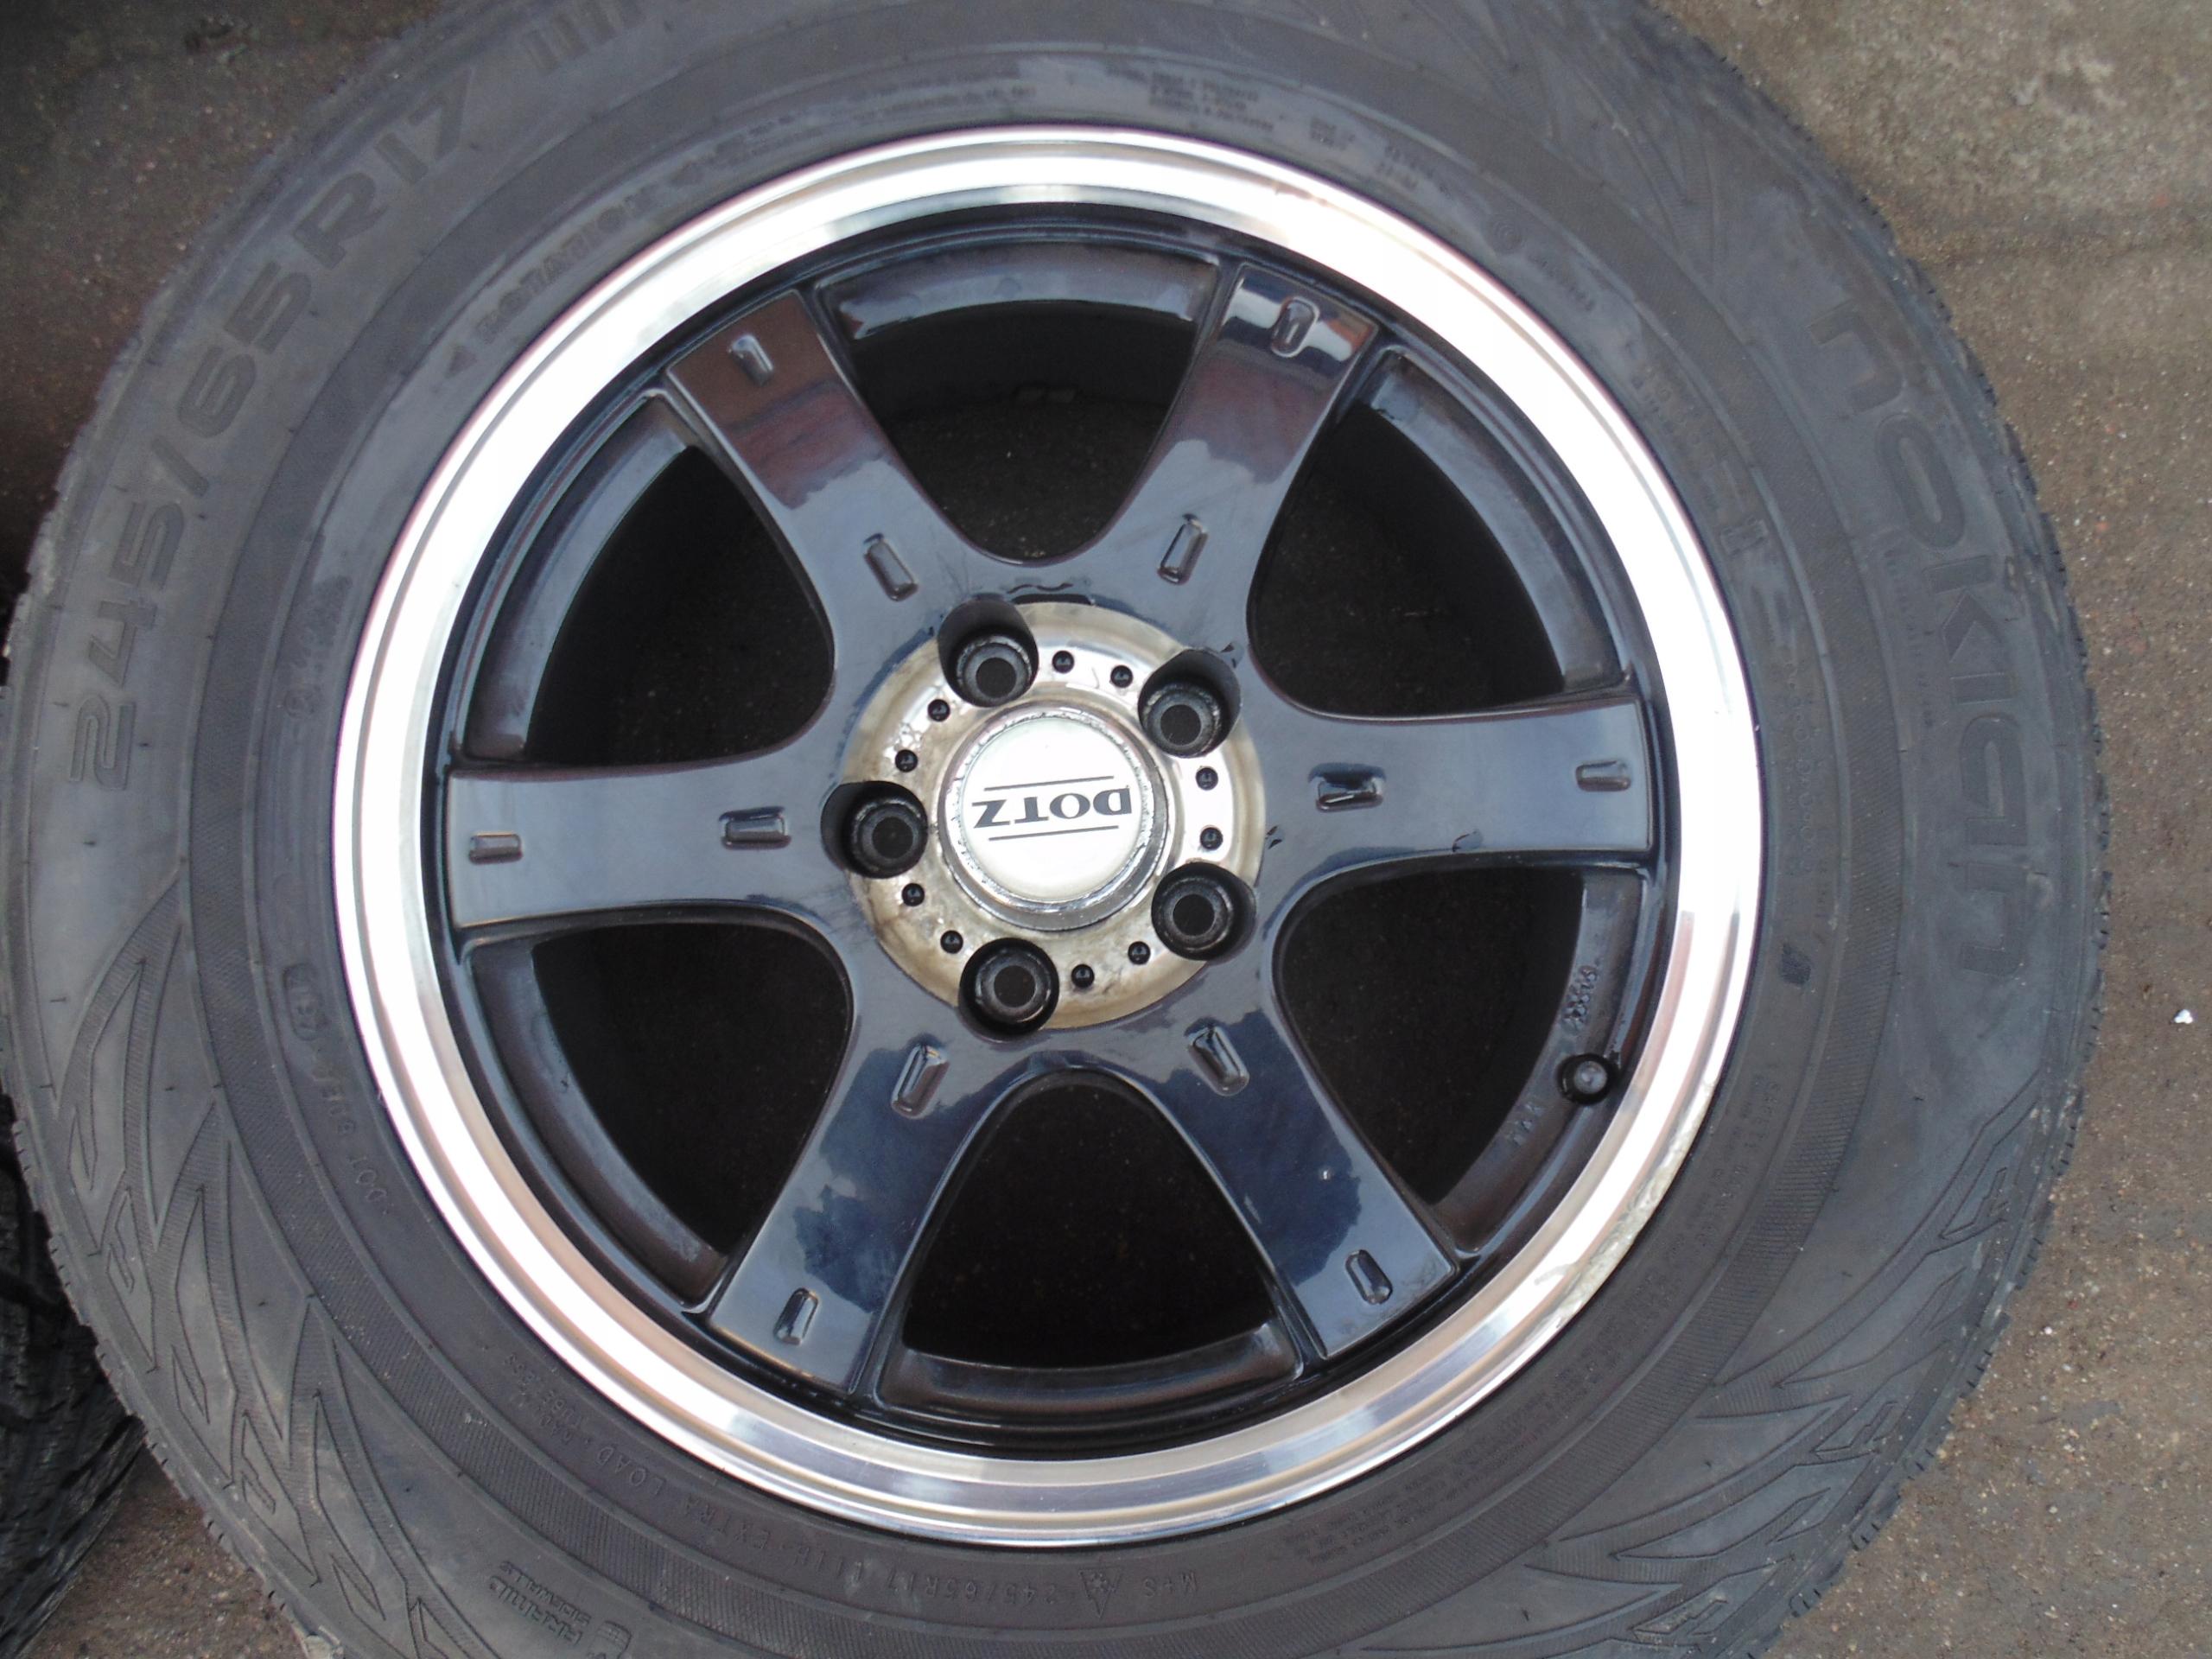 Picture of RIMS 17 DOTZ TYRES VW AMAROK 245/65/17 2018R